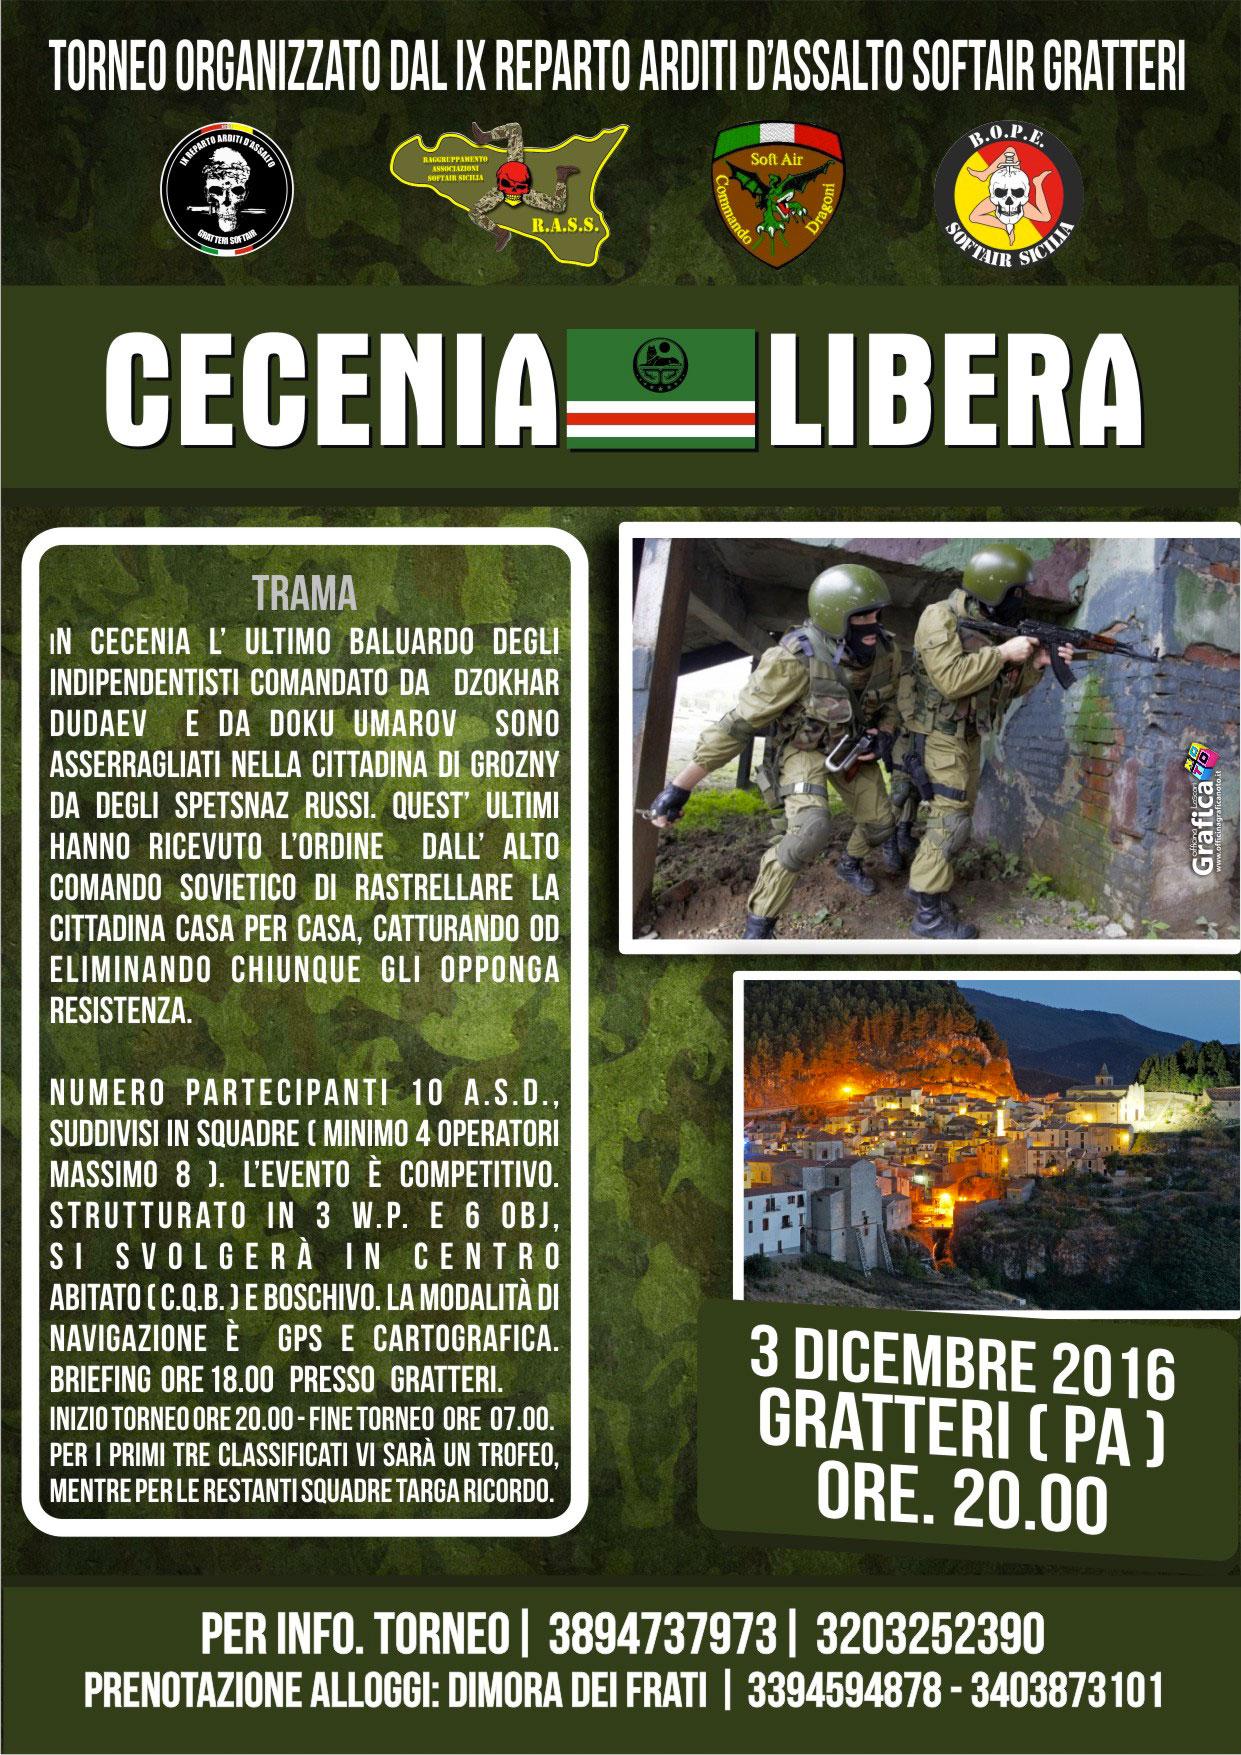 cecenia-libera-2016